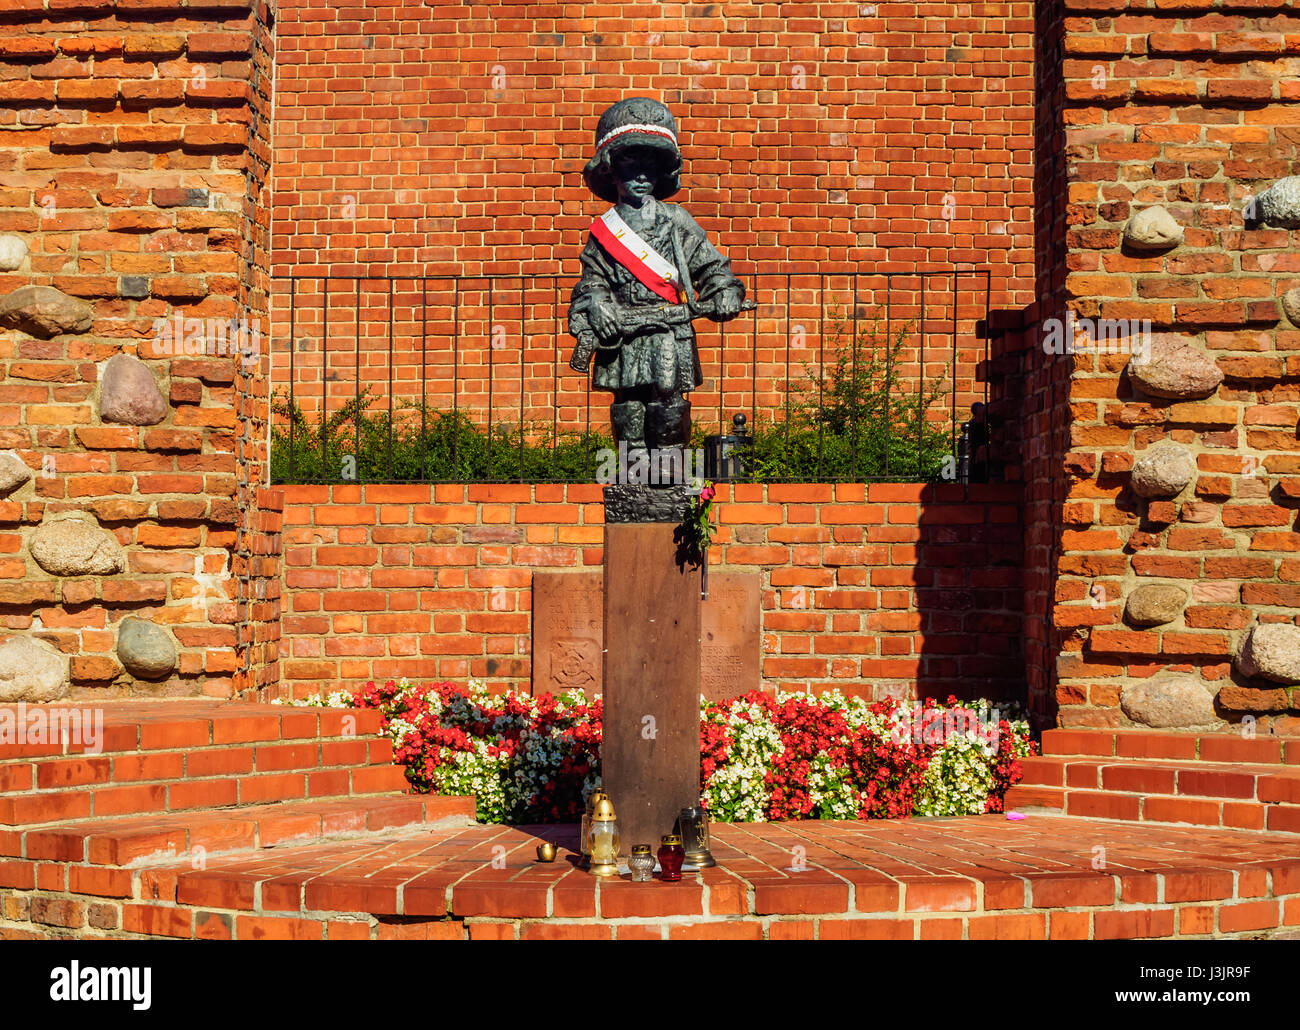 Poland, Masovian Voivodeship, Warsaw, Old Town, Little Insurrectionist sculpture by Jerzy Jarnuszkiewicz Stock Photo